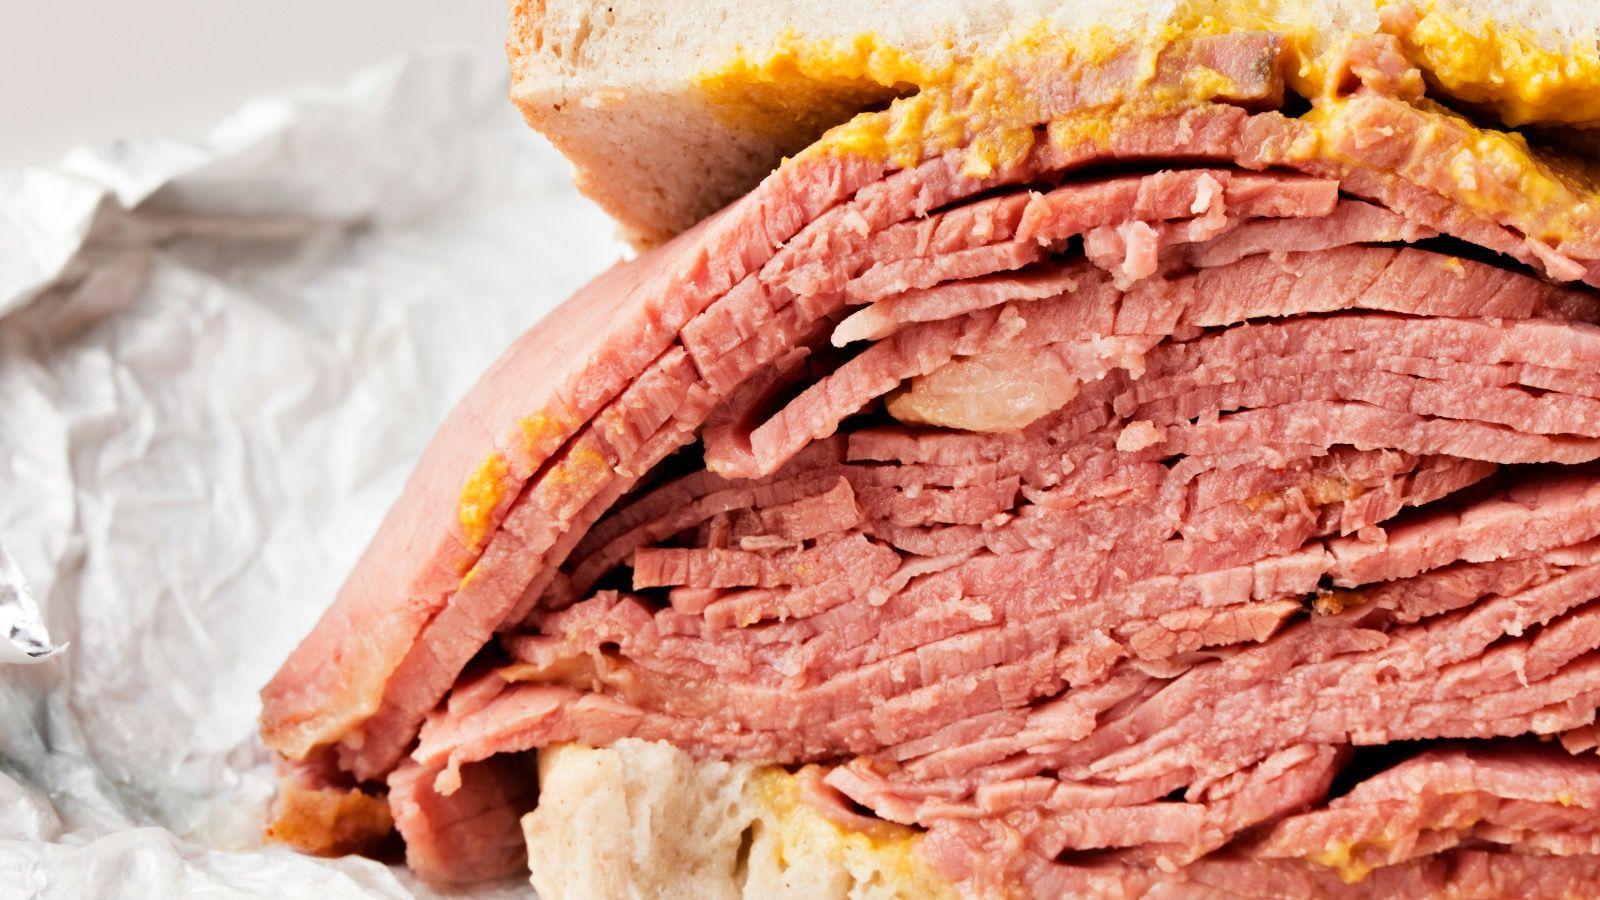 A classic pastrami sandwich on rye.